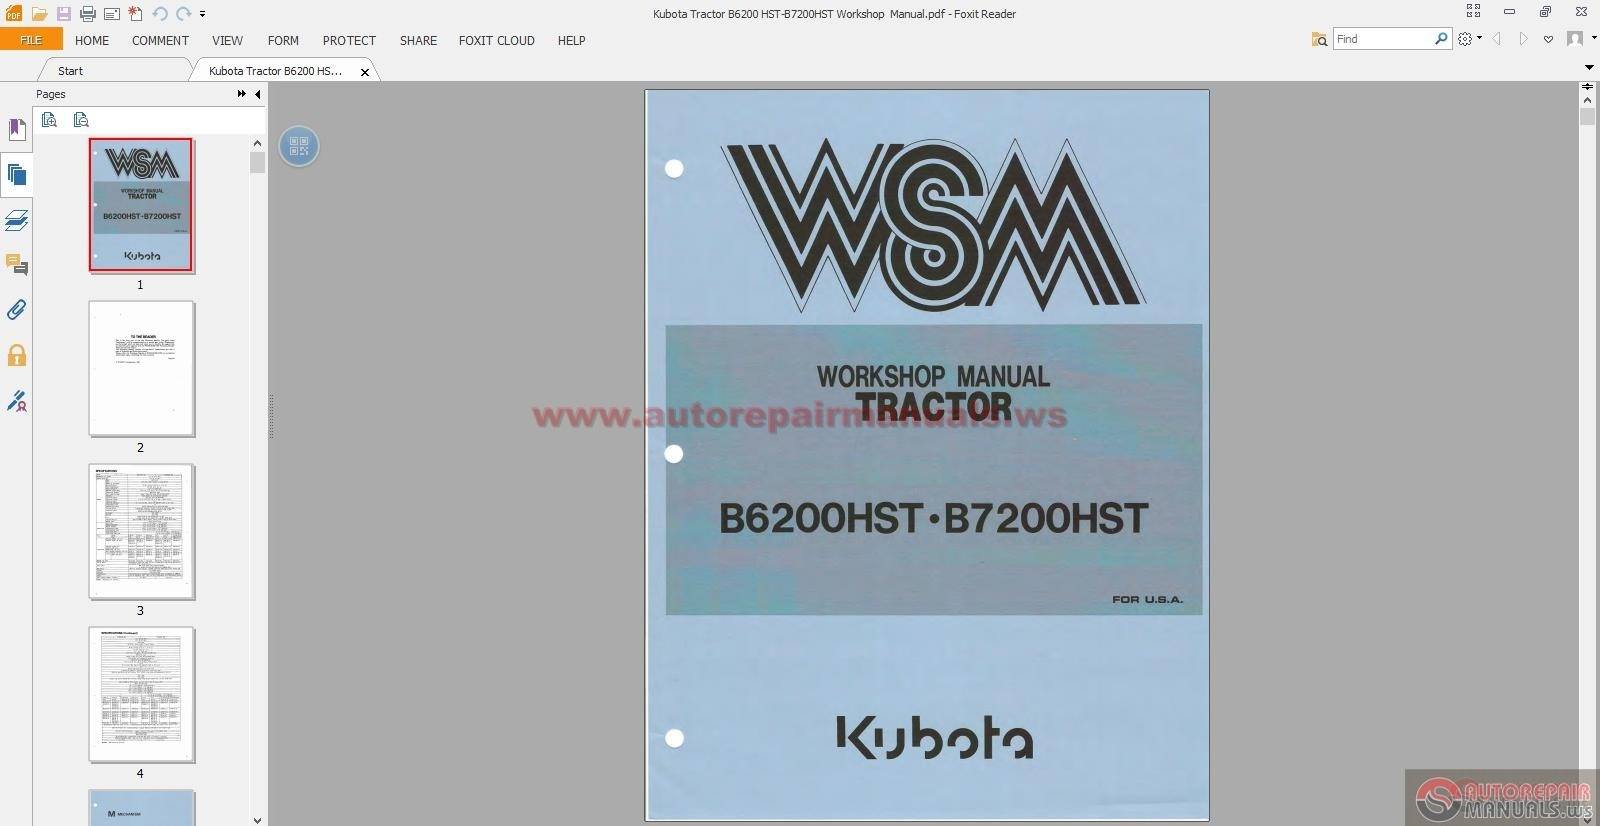 kubota rtv900 repair manual pdf download autos post. Black Bedroom Furniture Sets. Home Design Ideas